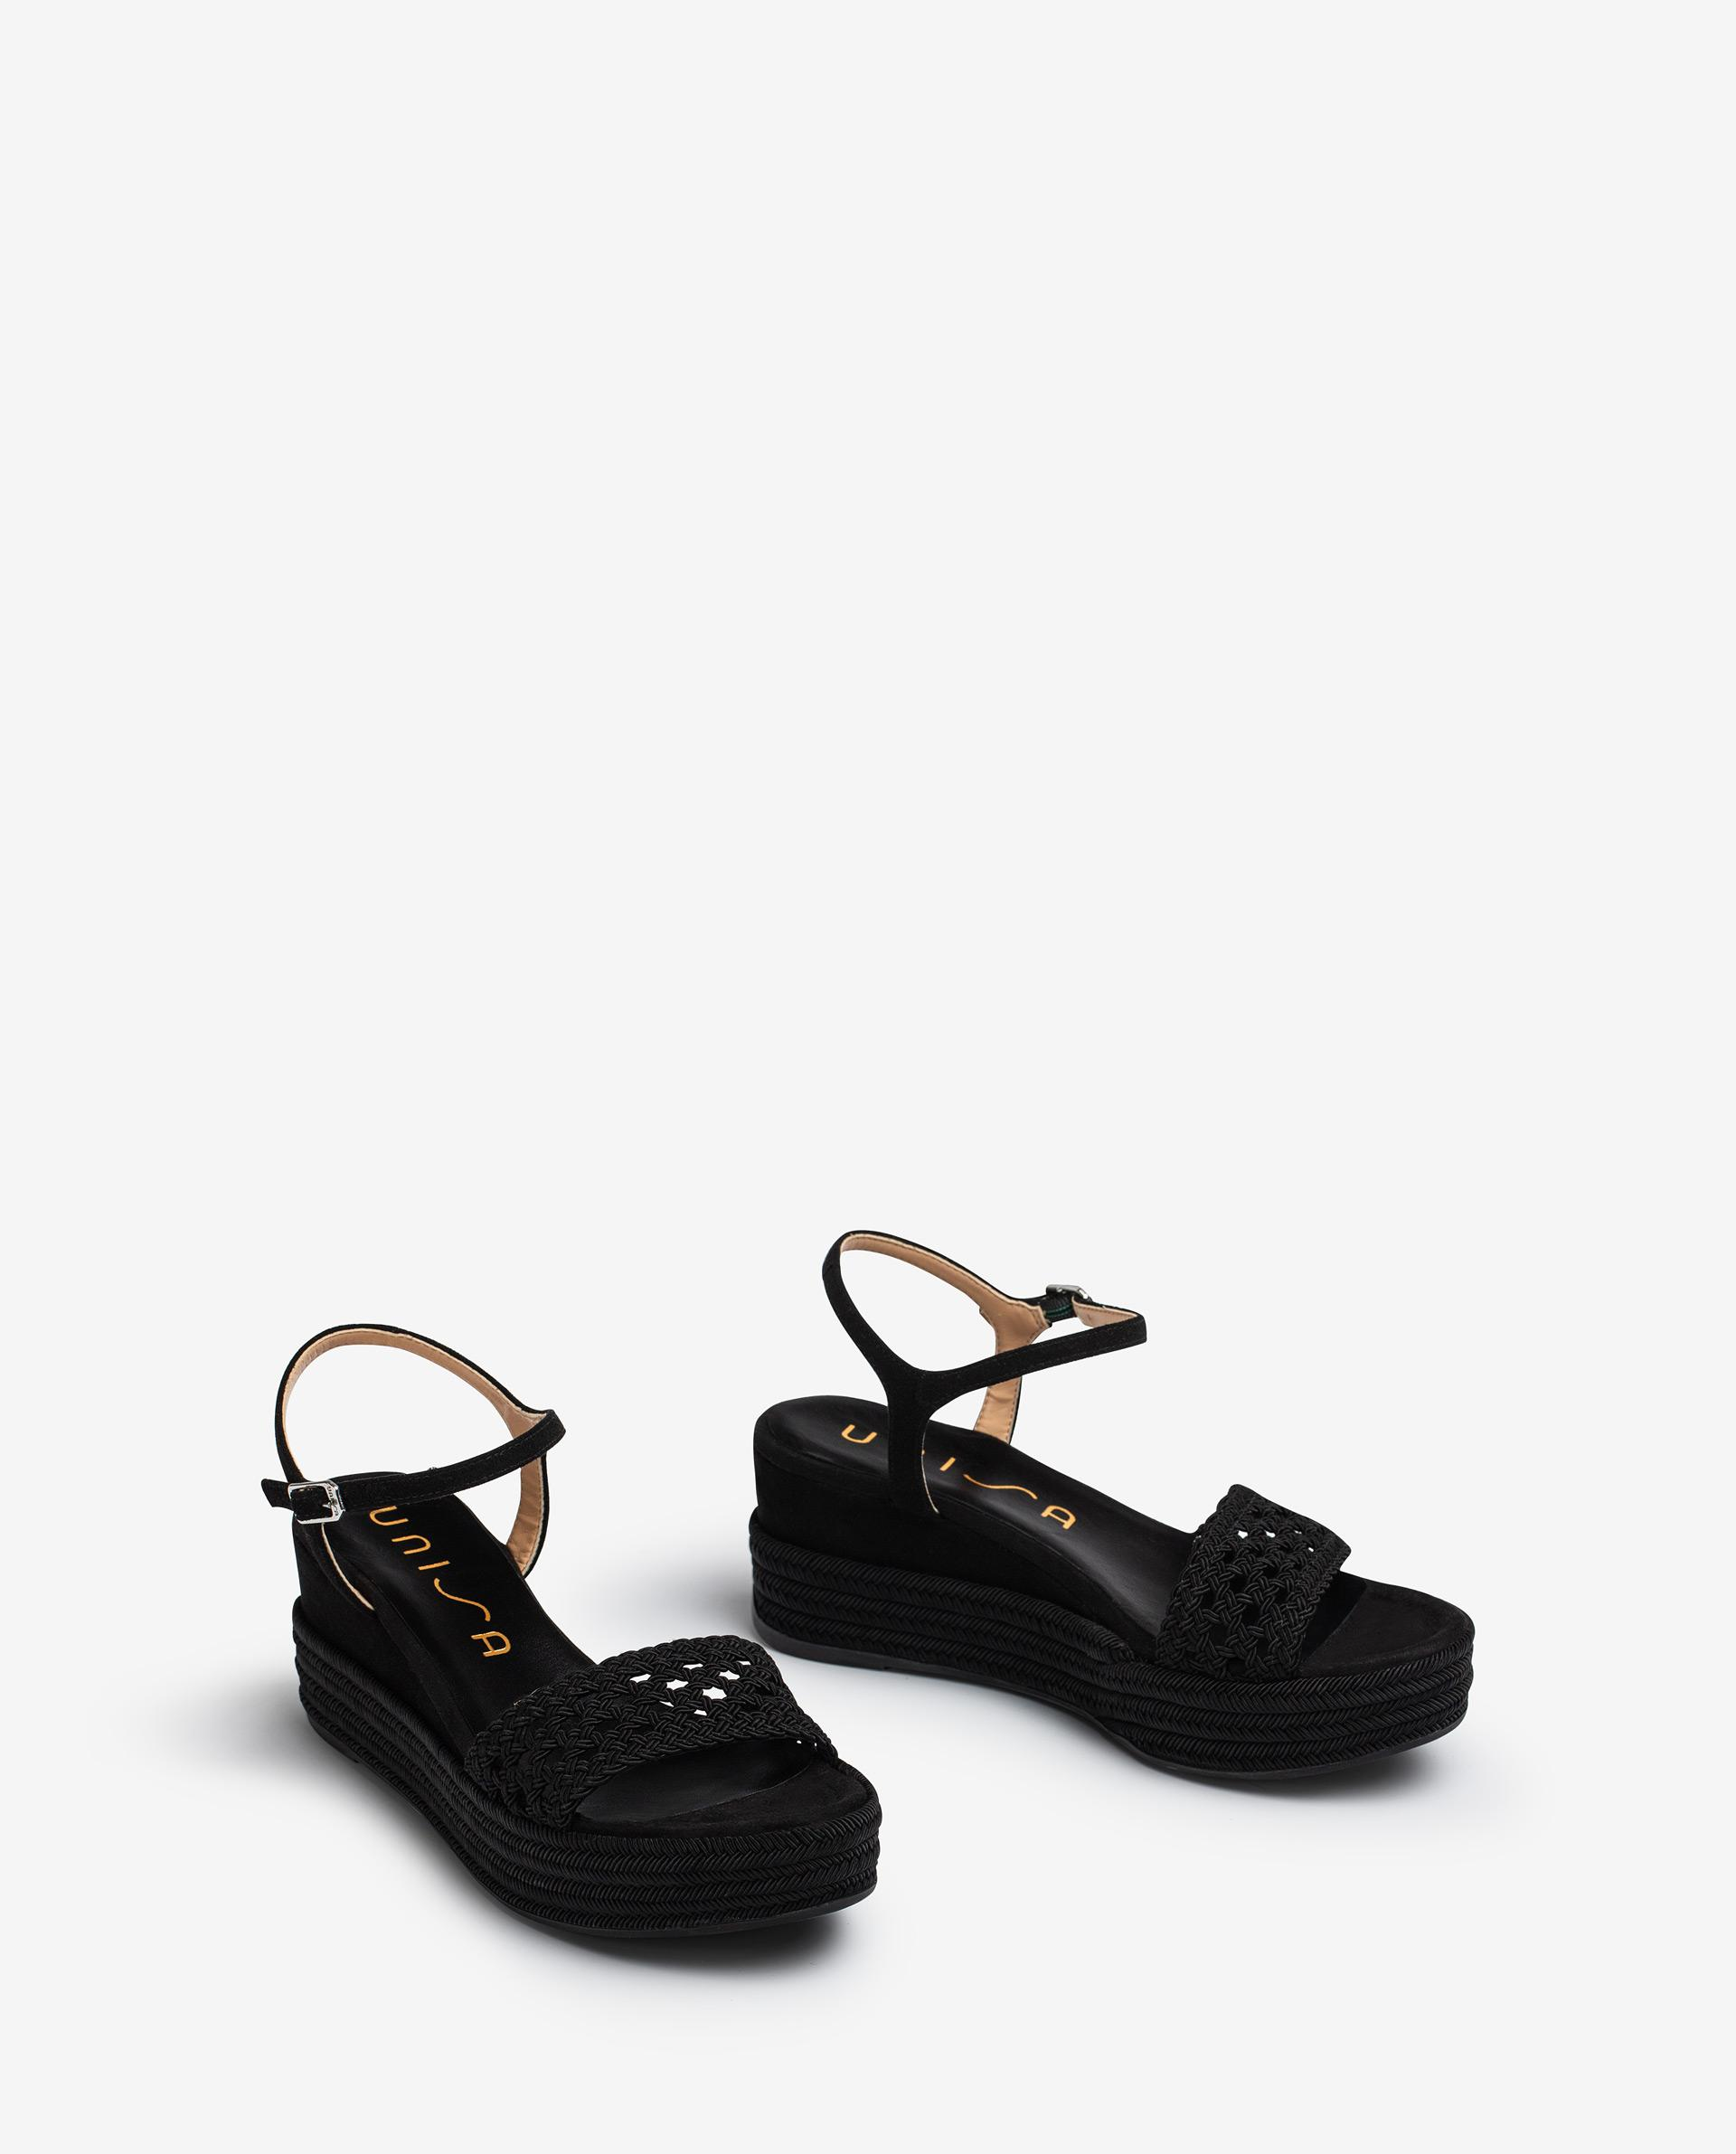 UNISA Wedge sandals braided fabric KISOME_21_KS 2